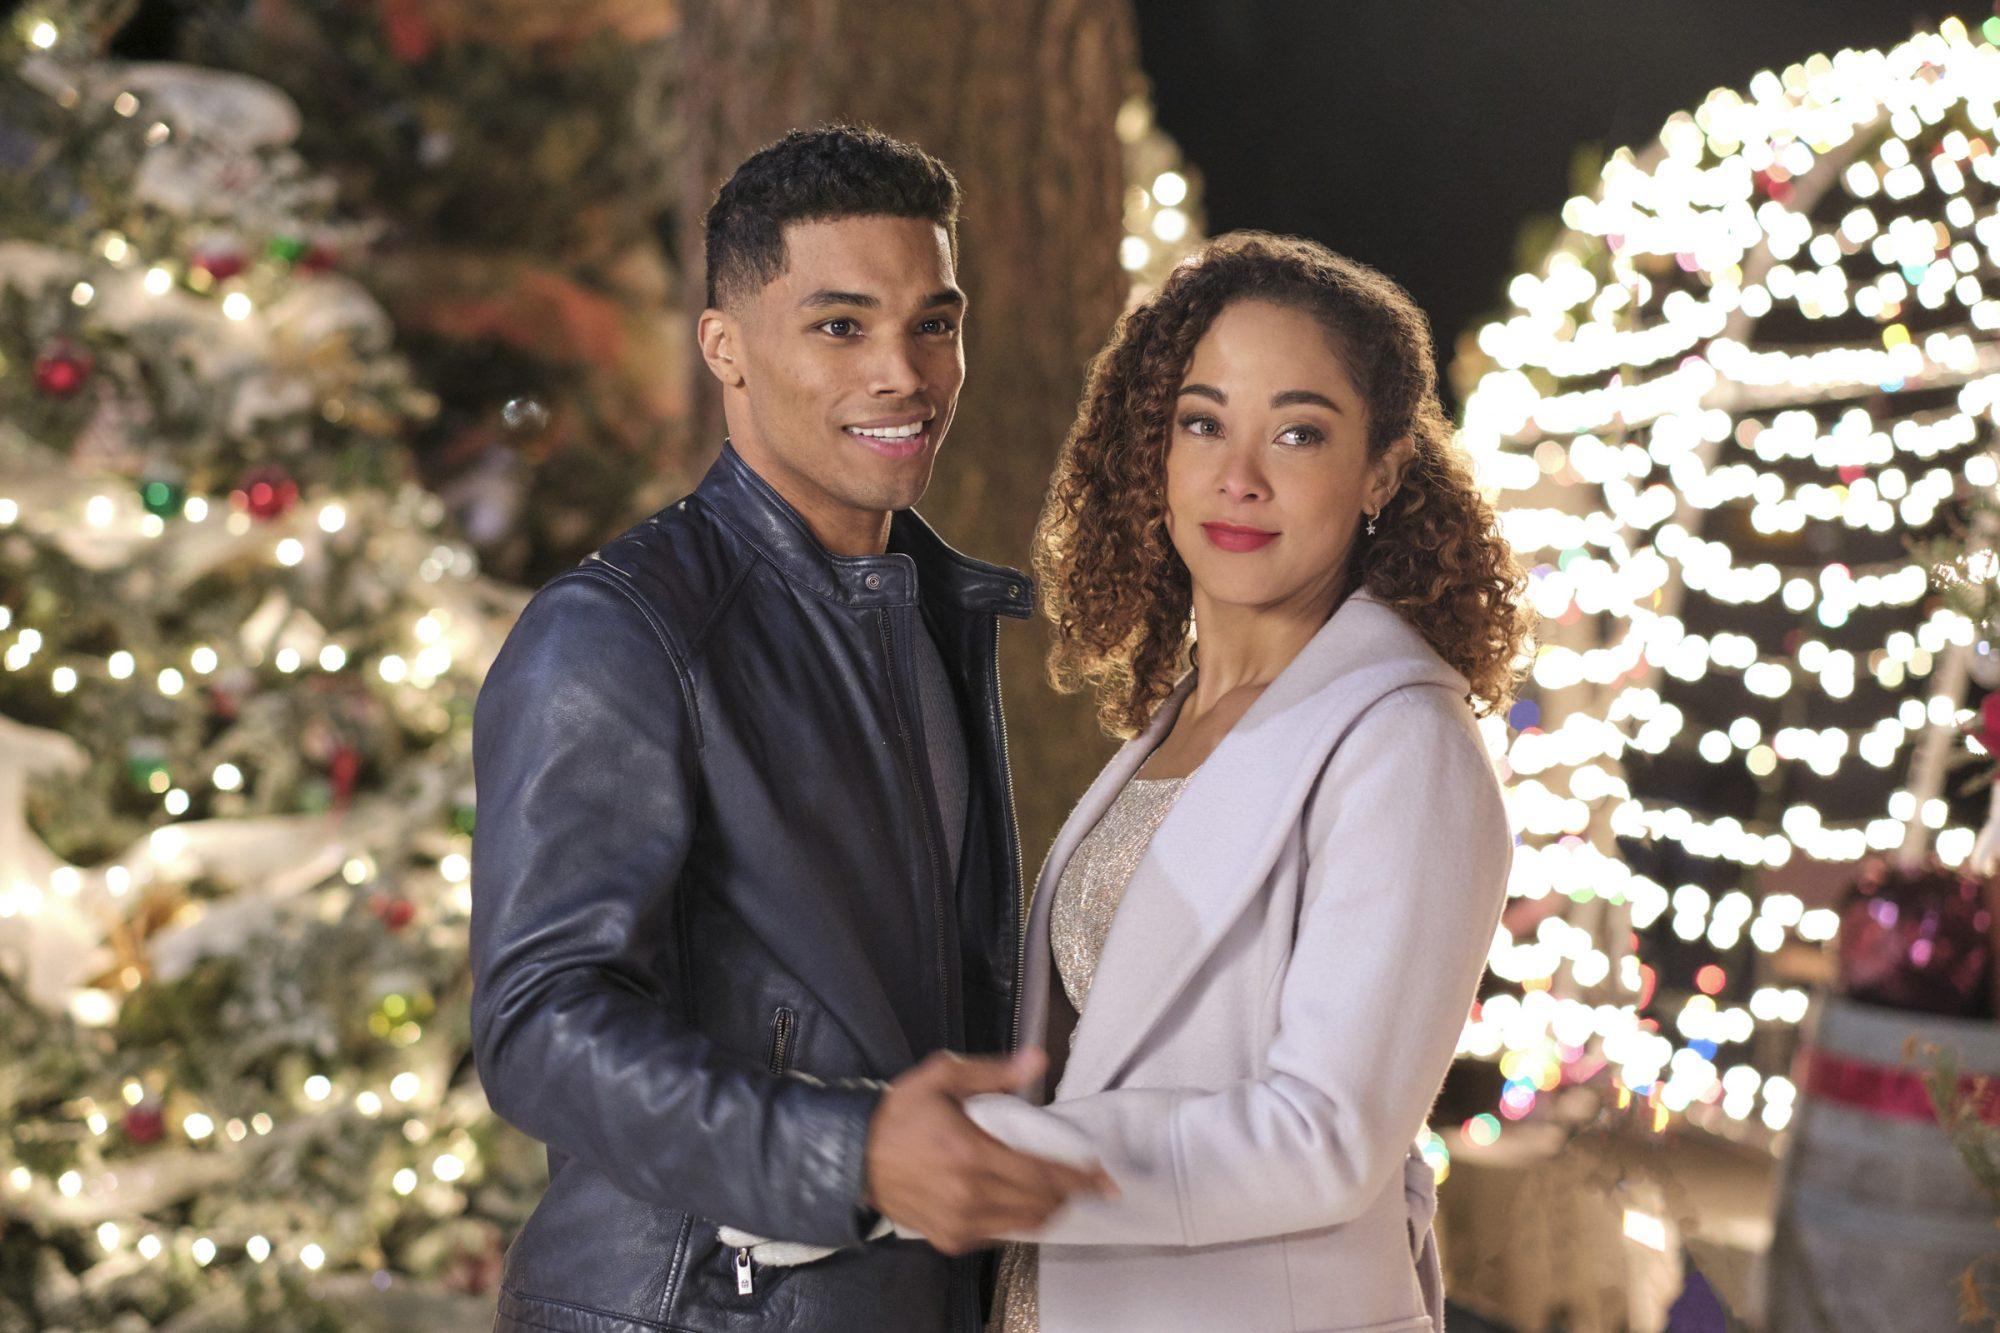 A Christmas DuetRome Flynn and Chaley Rose  CR: David Dolsen/Crown Media